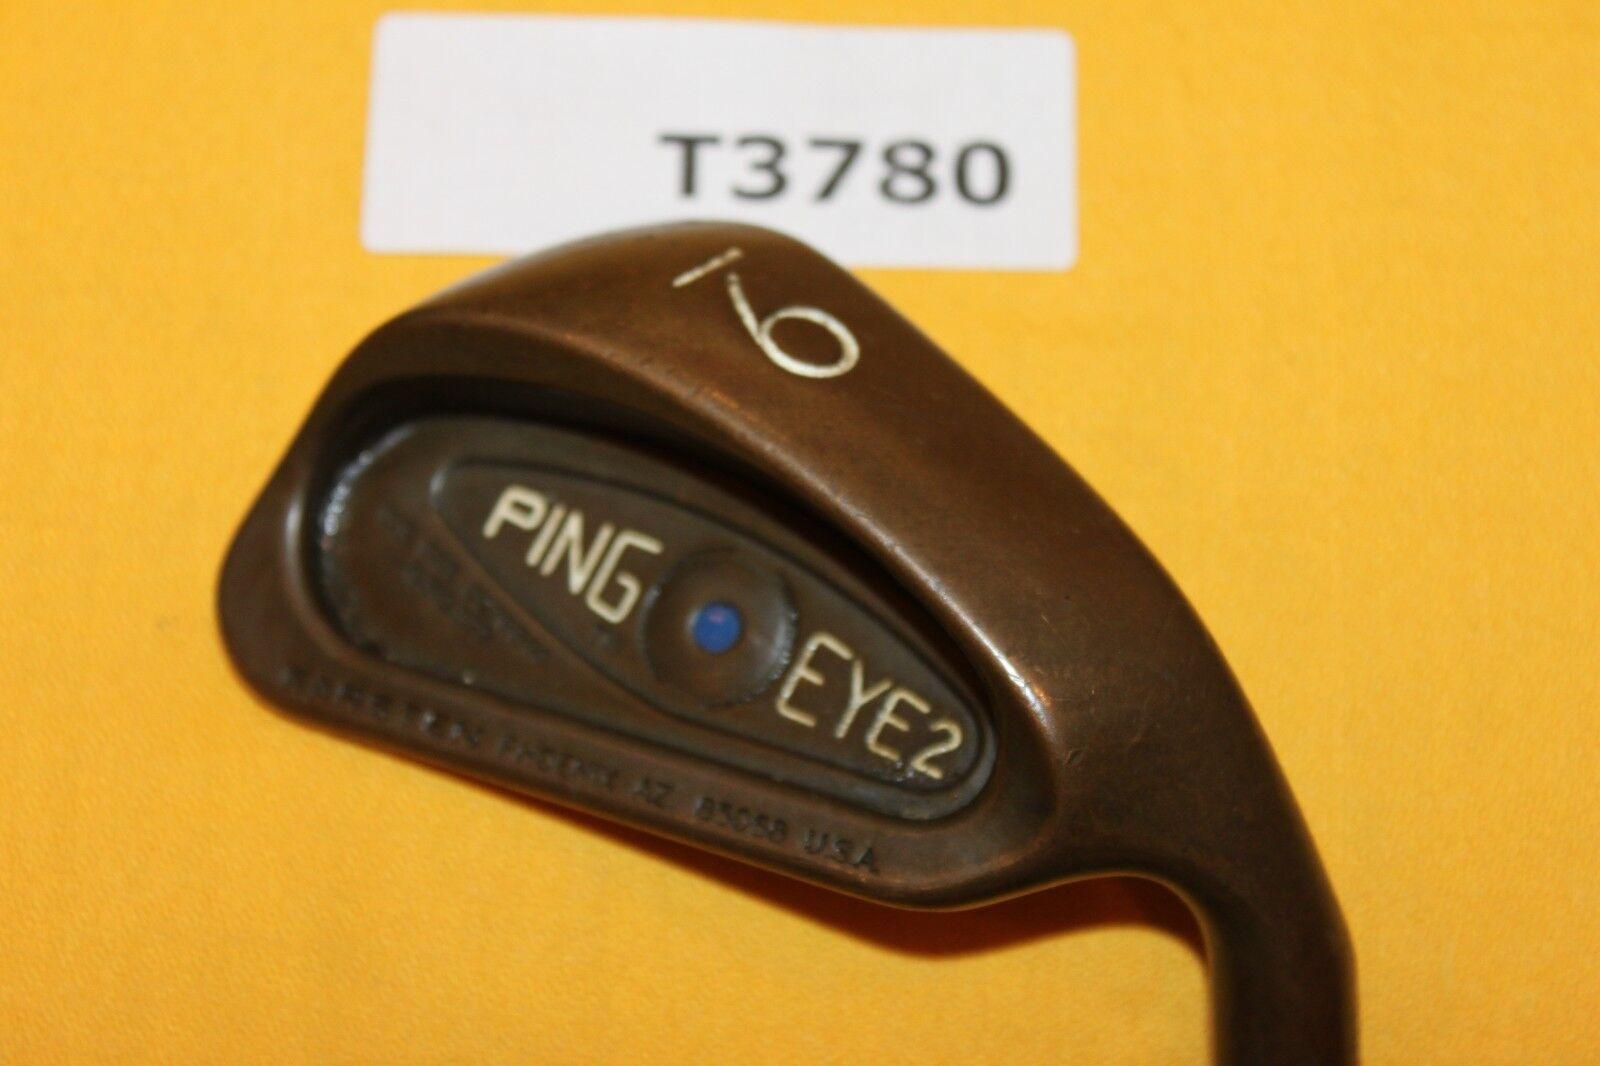 Ping Eye 2 Karsten Berilio Cobre Becu Punto  Azul 9 Hierro ZZ livianos St T3780  suministro de productos de calidad